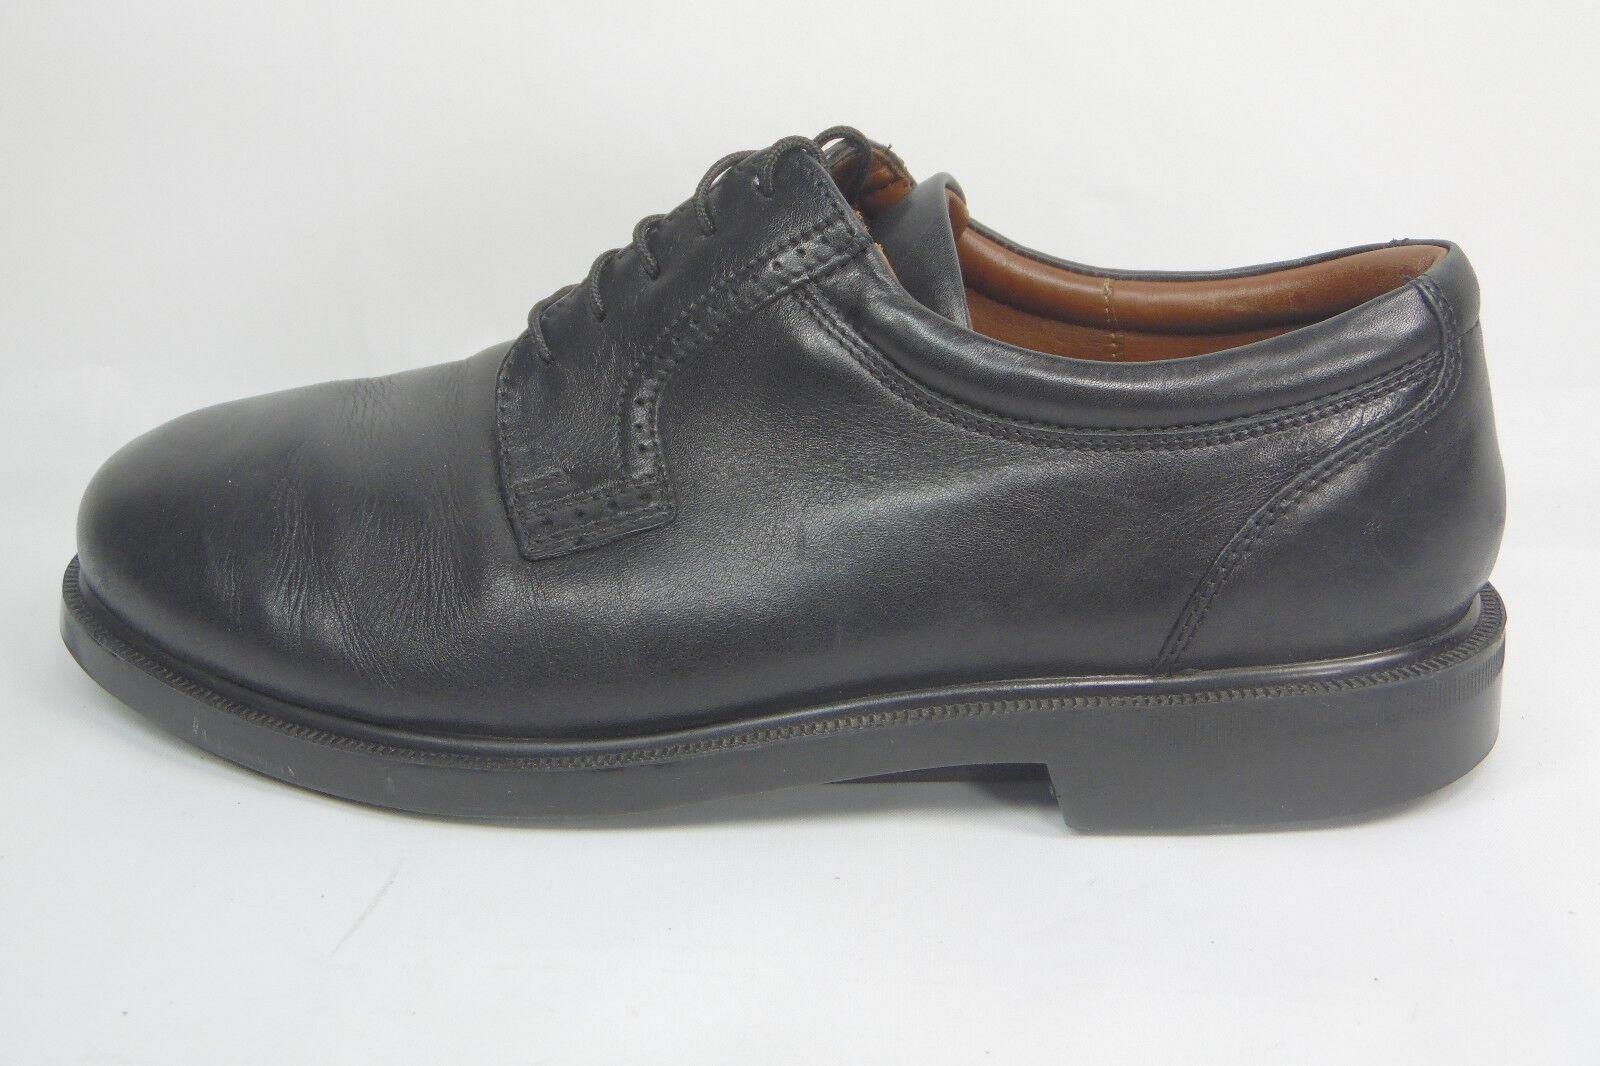 Florsheim Uomo Noble leather plain toe  Shoes 17080-01 17080-01 17080-01 Nero 8.5W 17eeea